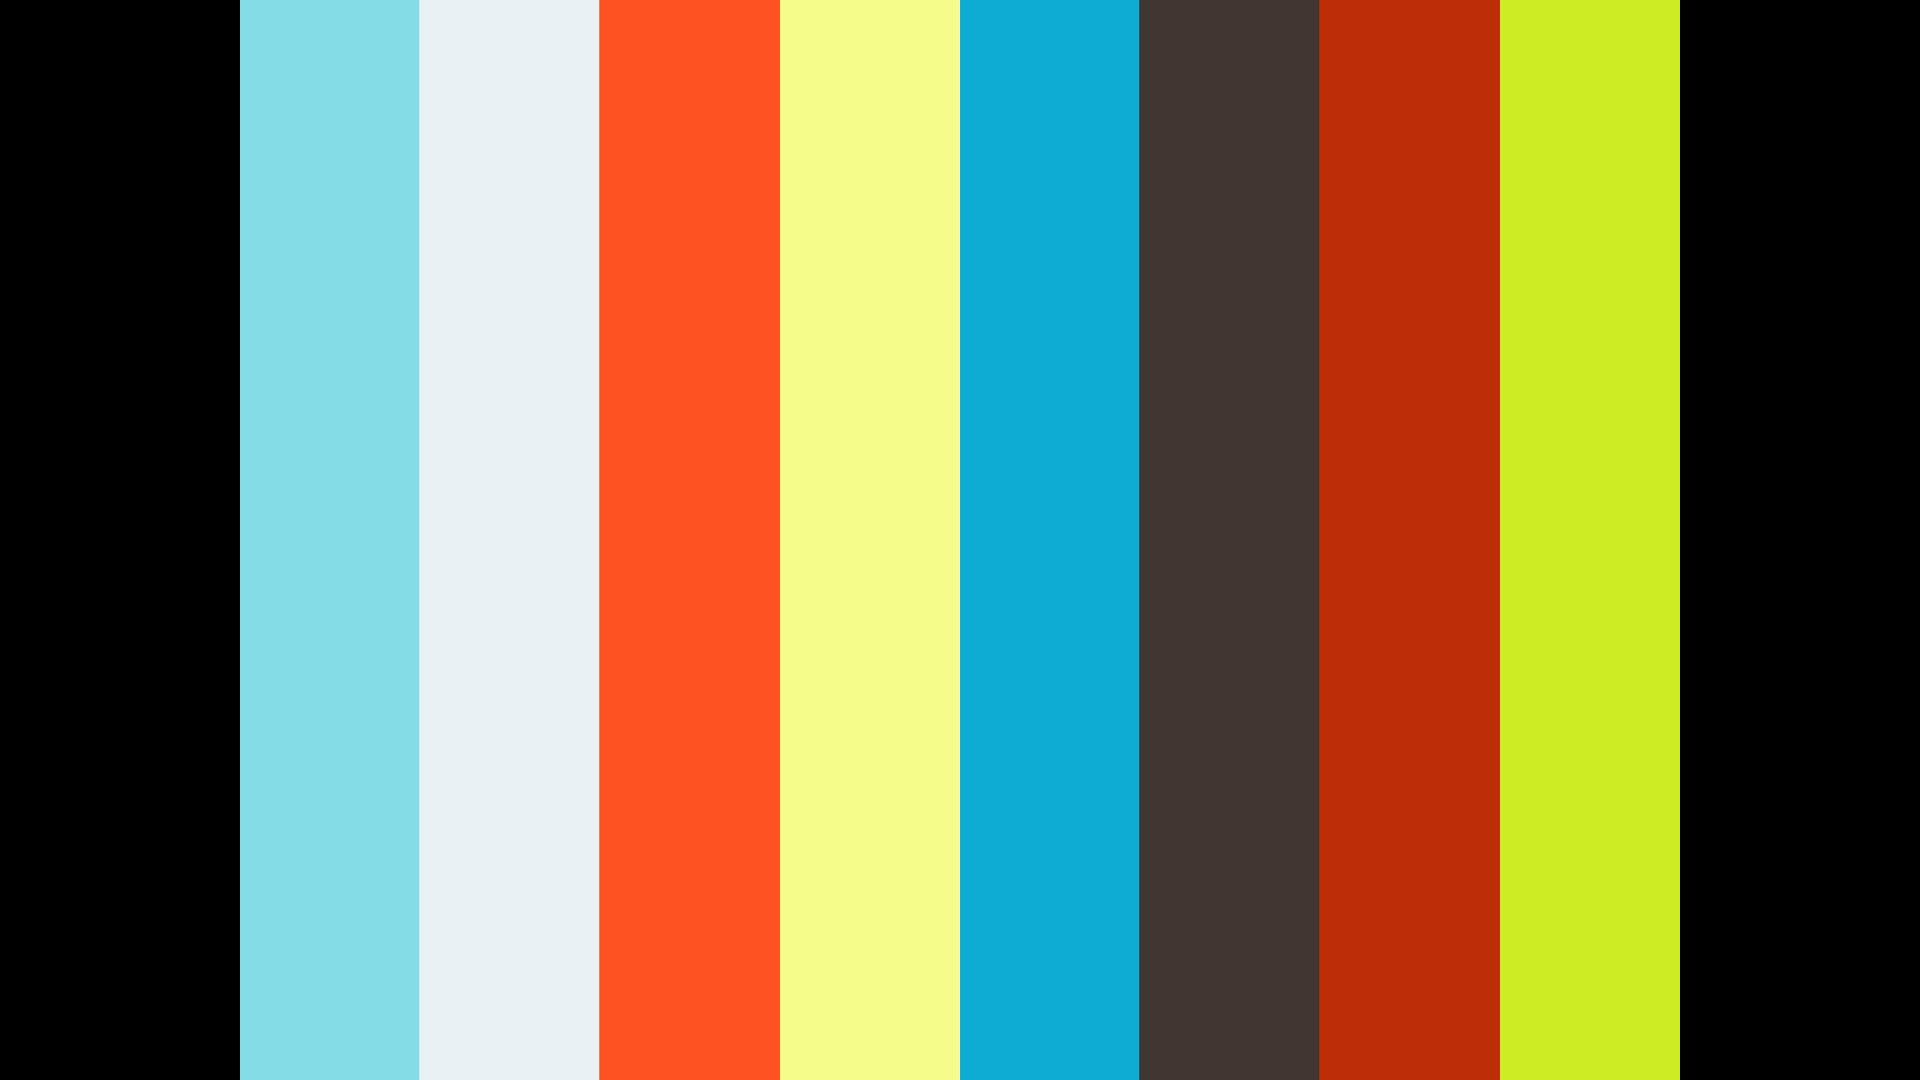 TBD-Frying-Pan-Road-Basalt-81621-Unbranded.mp4